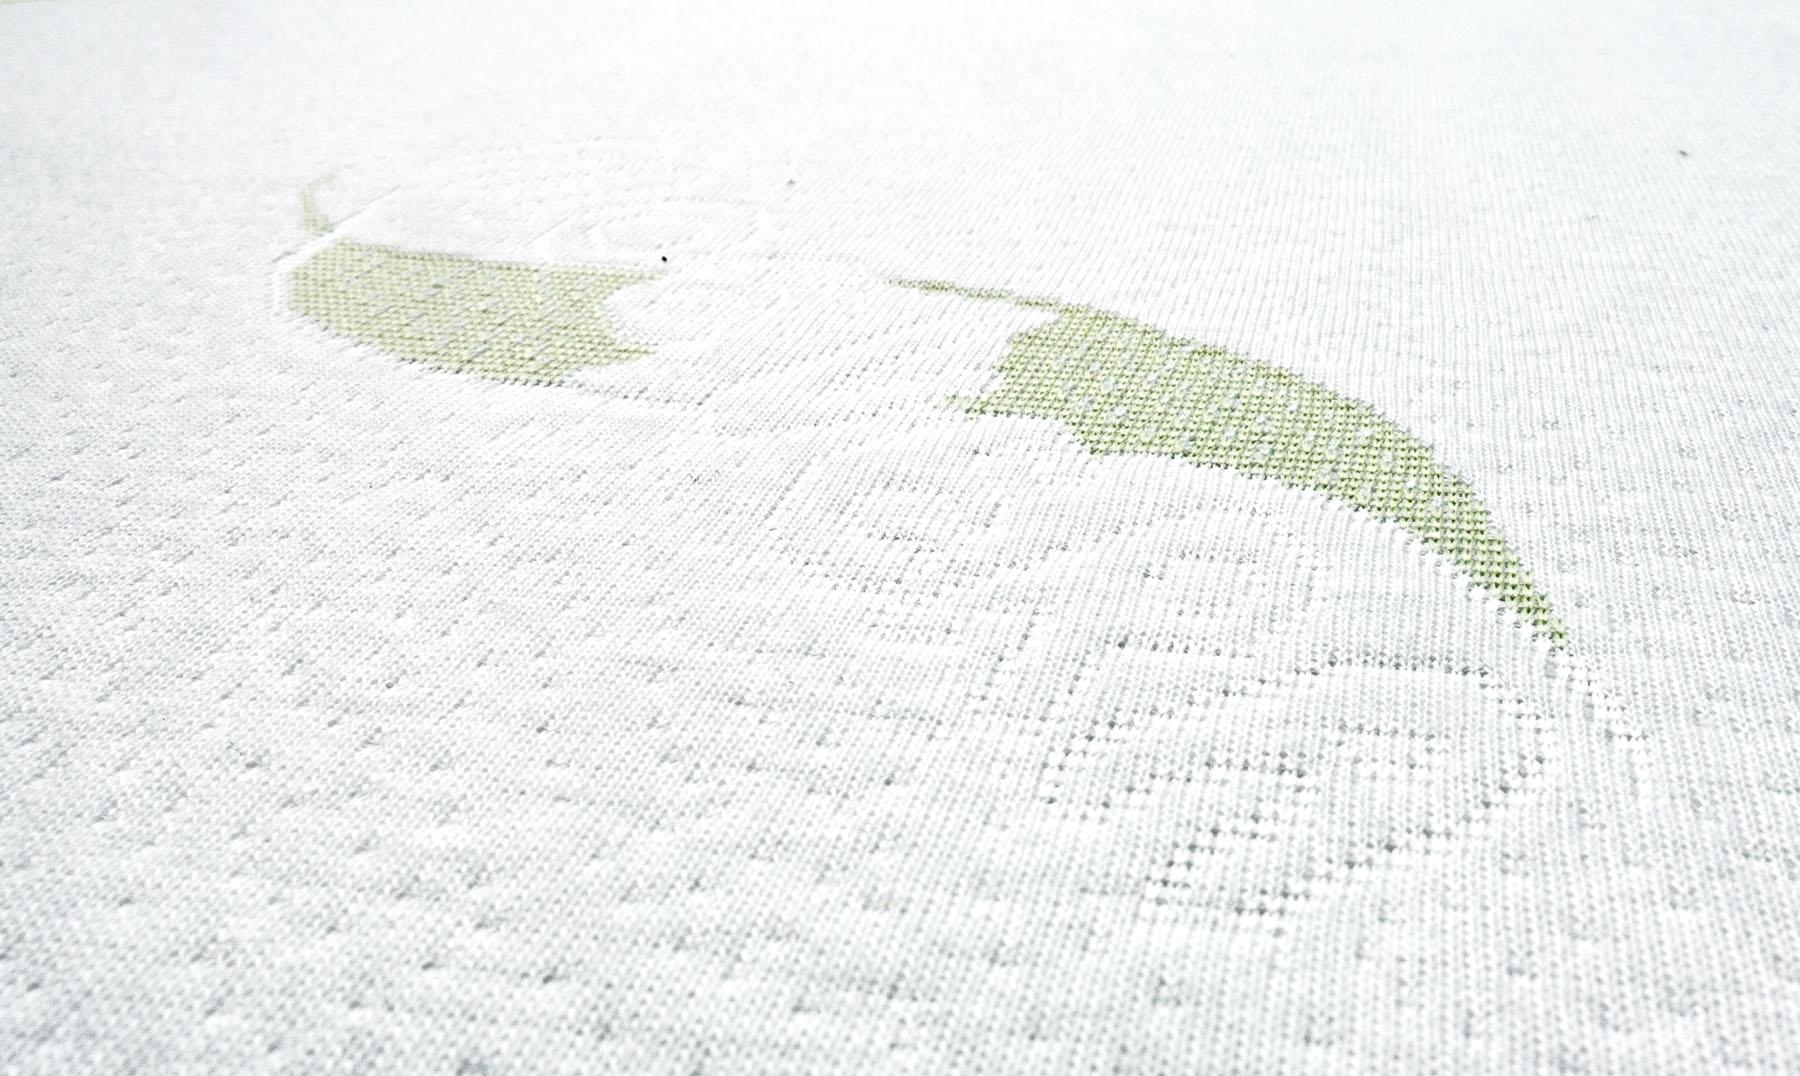 Saltea Sensillo Latex-cocos-spuma-cocos cu Aloe Vera 120x60x12 cm [1]